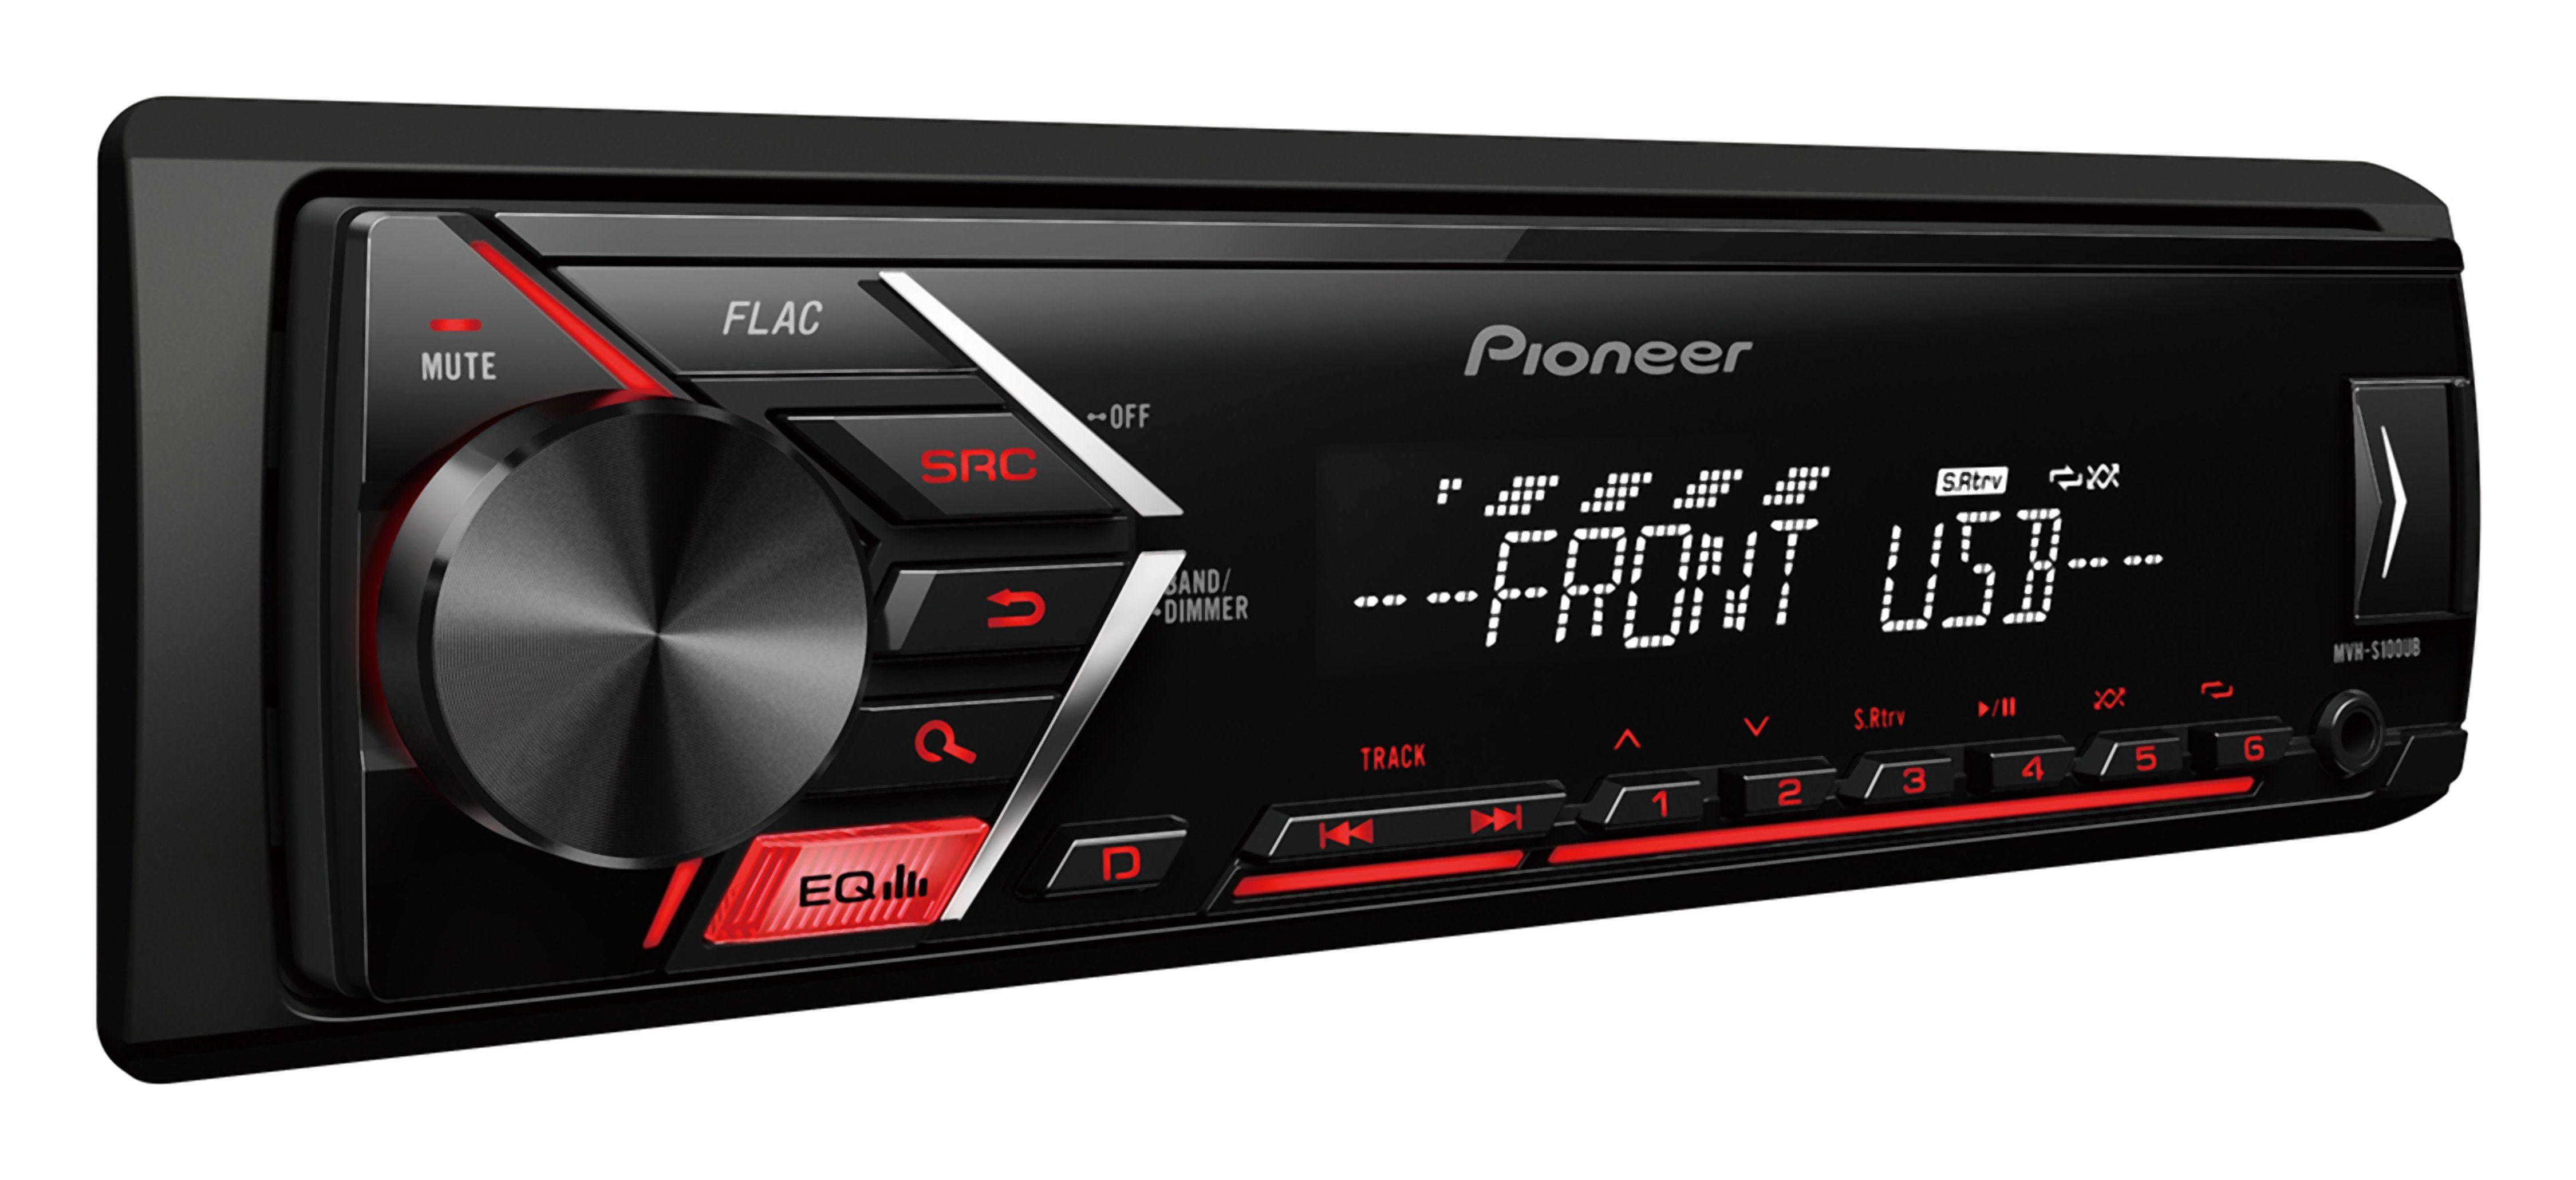 PIONEER 1-DIN Autoradio mit USB, MP3 & AUX-In »MVH-S100UB«